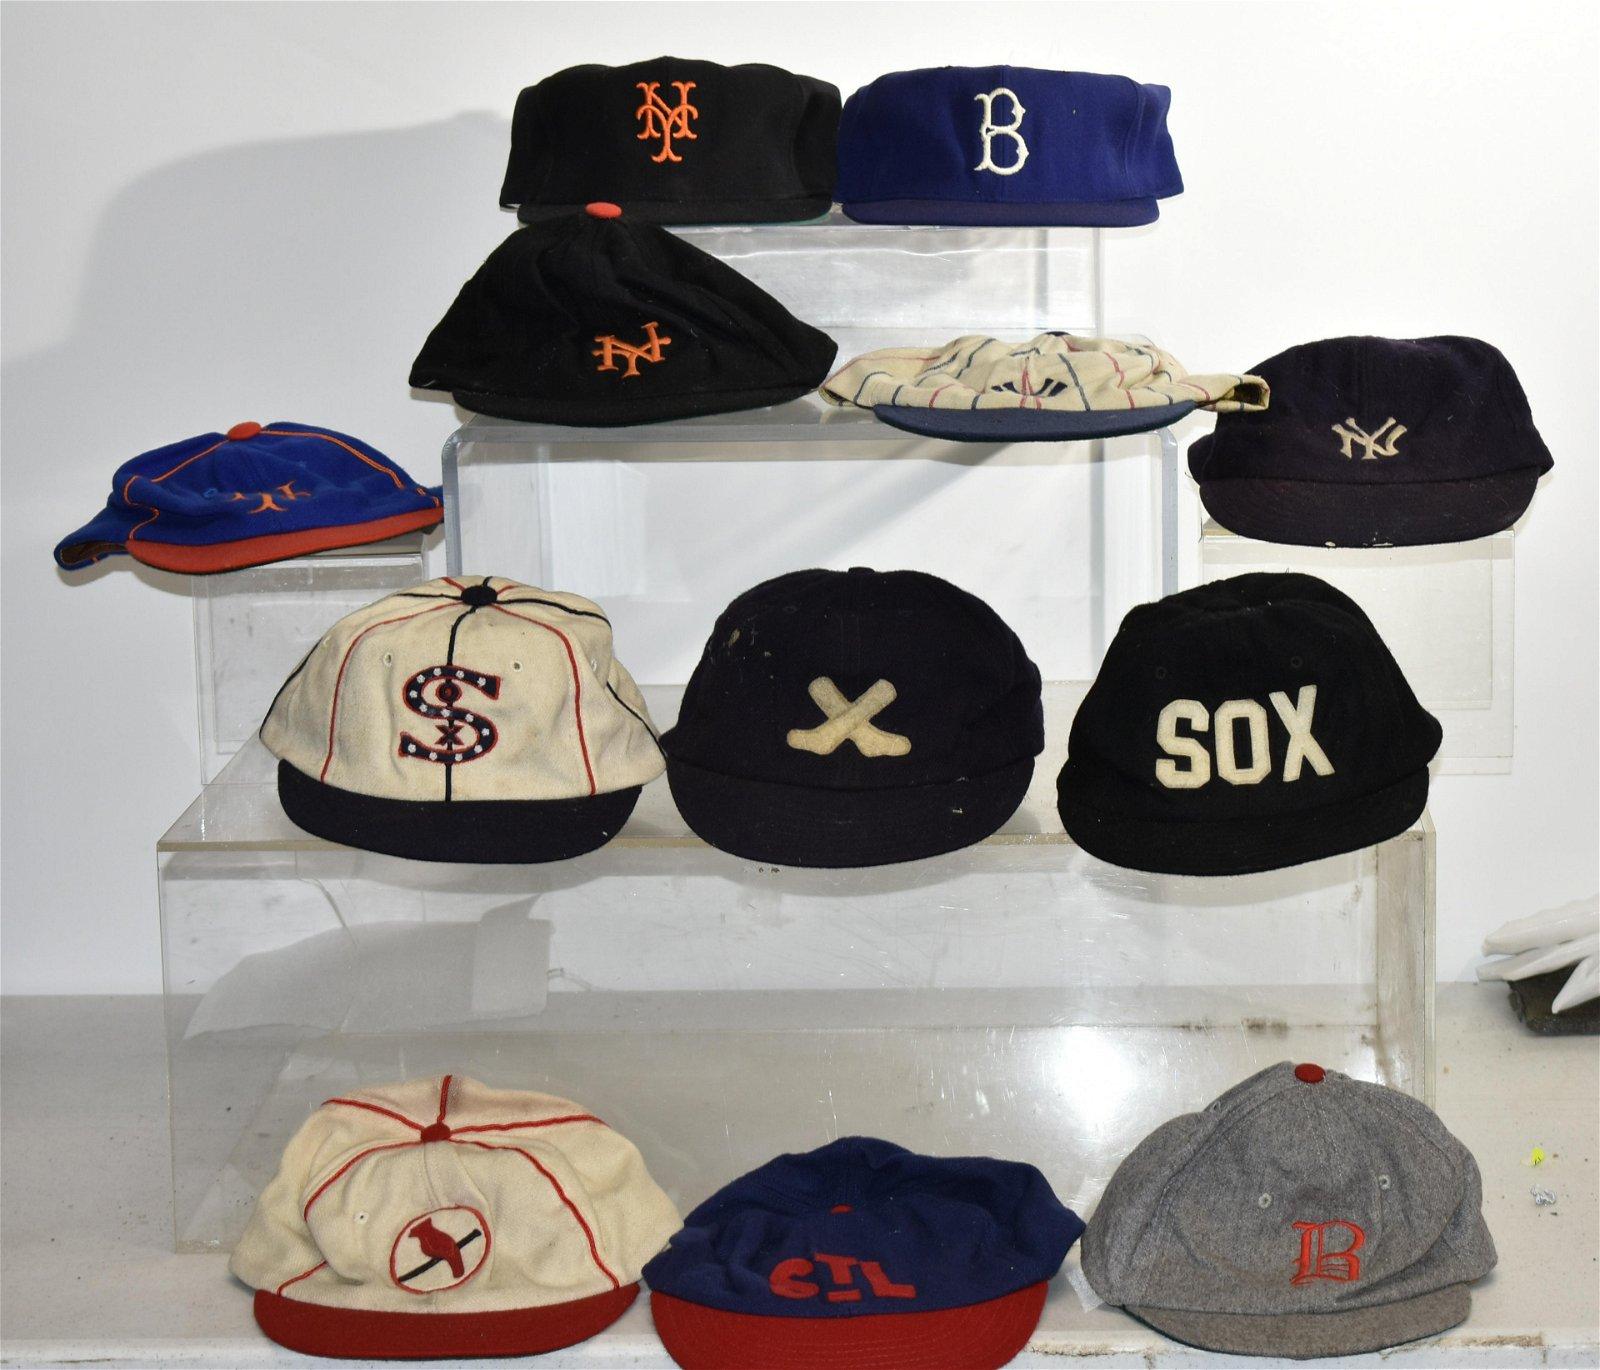 12 MLB Baseball Caps Including many Throwbacks